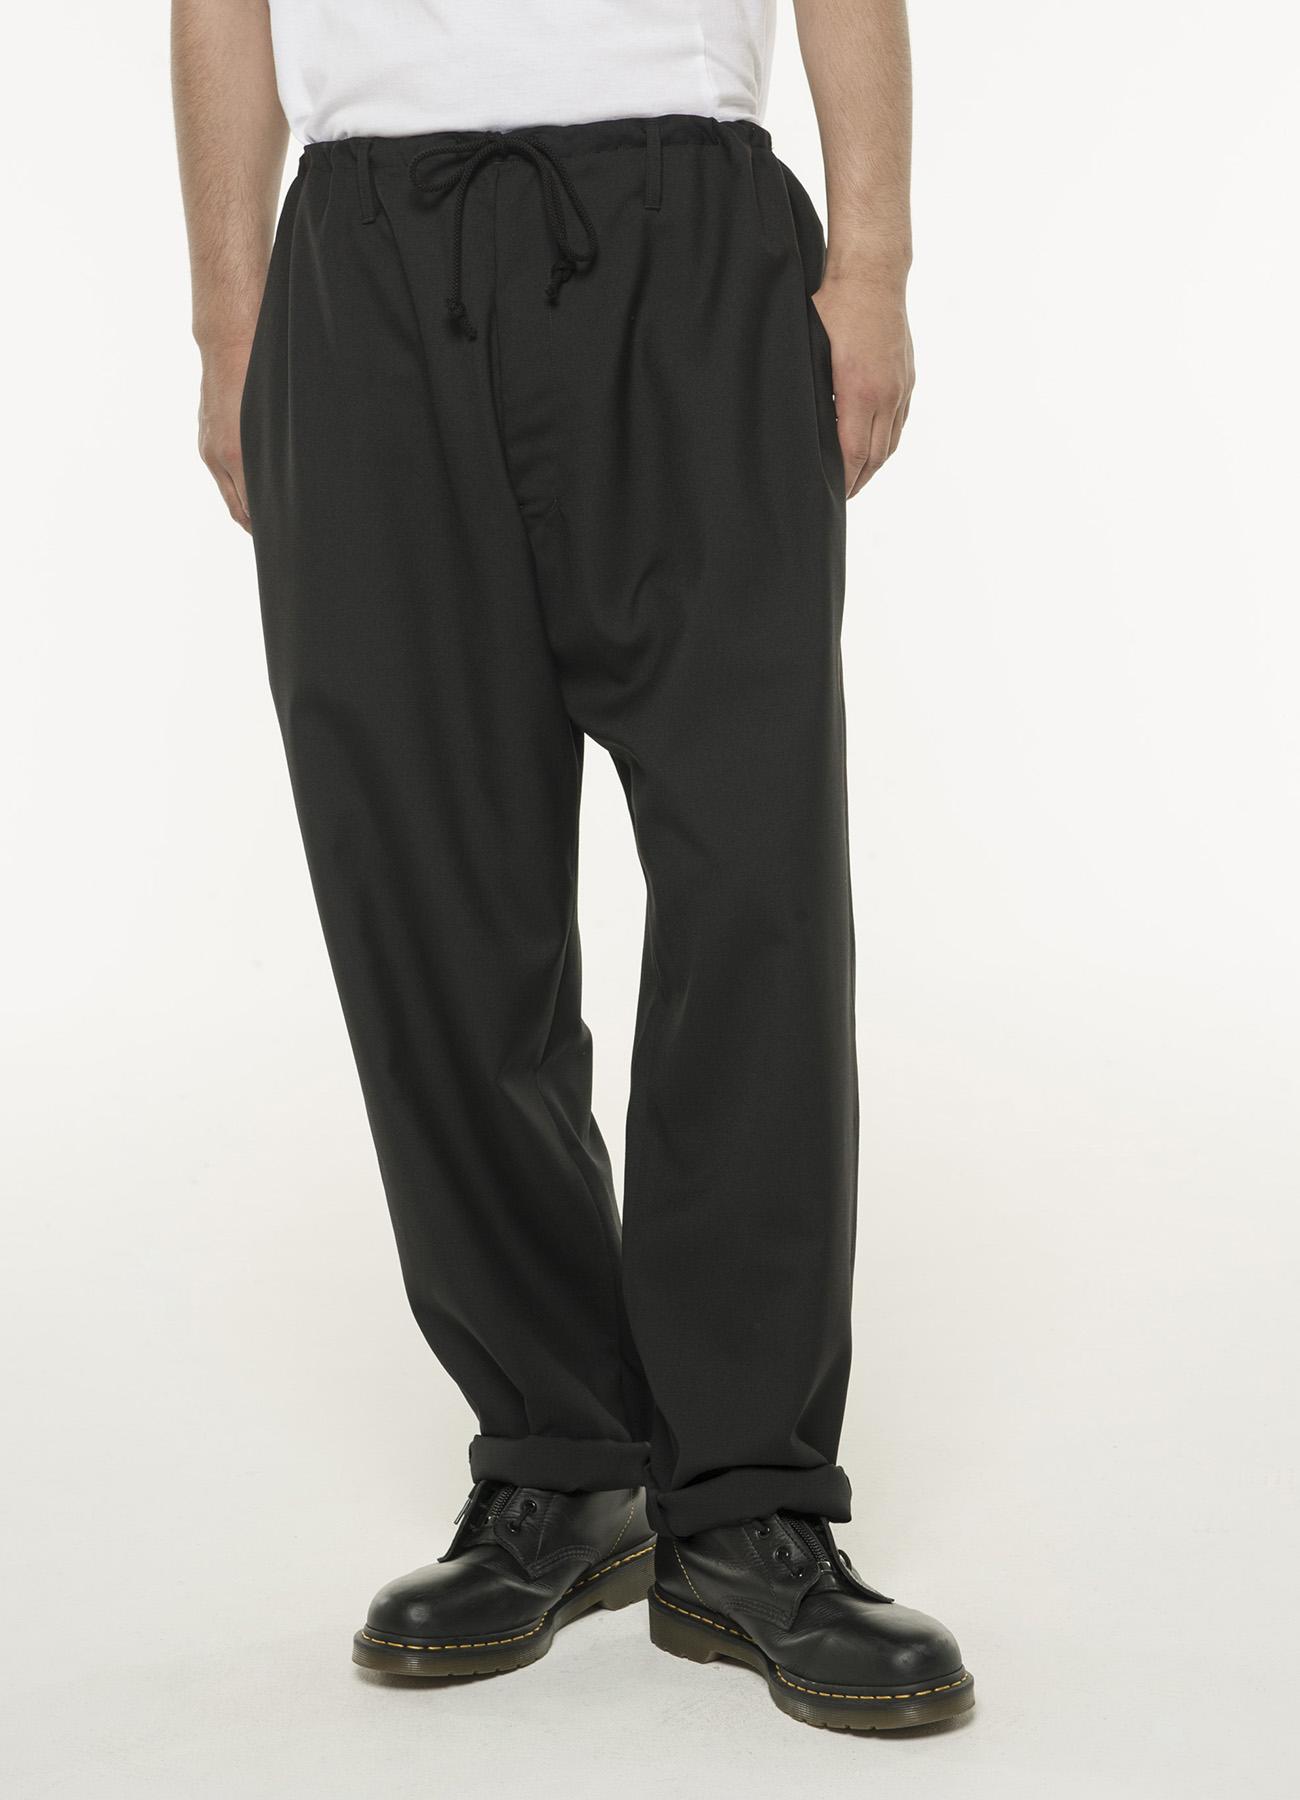 T/W Gabardine Waist string Pants